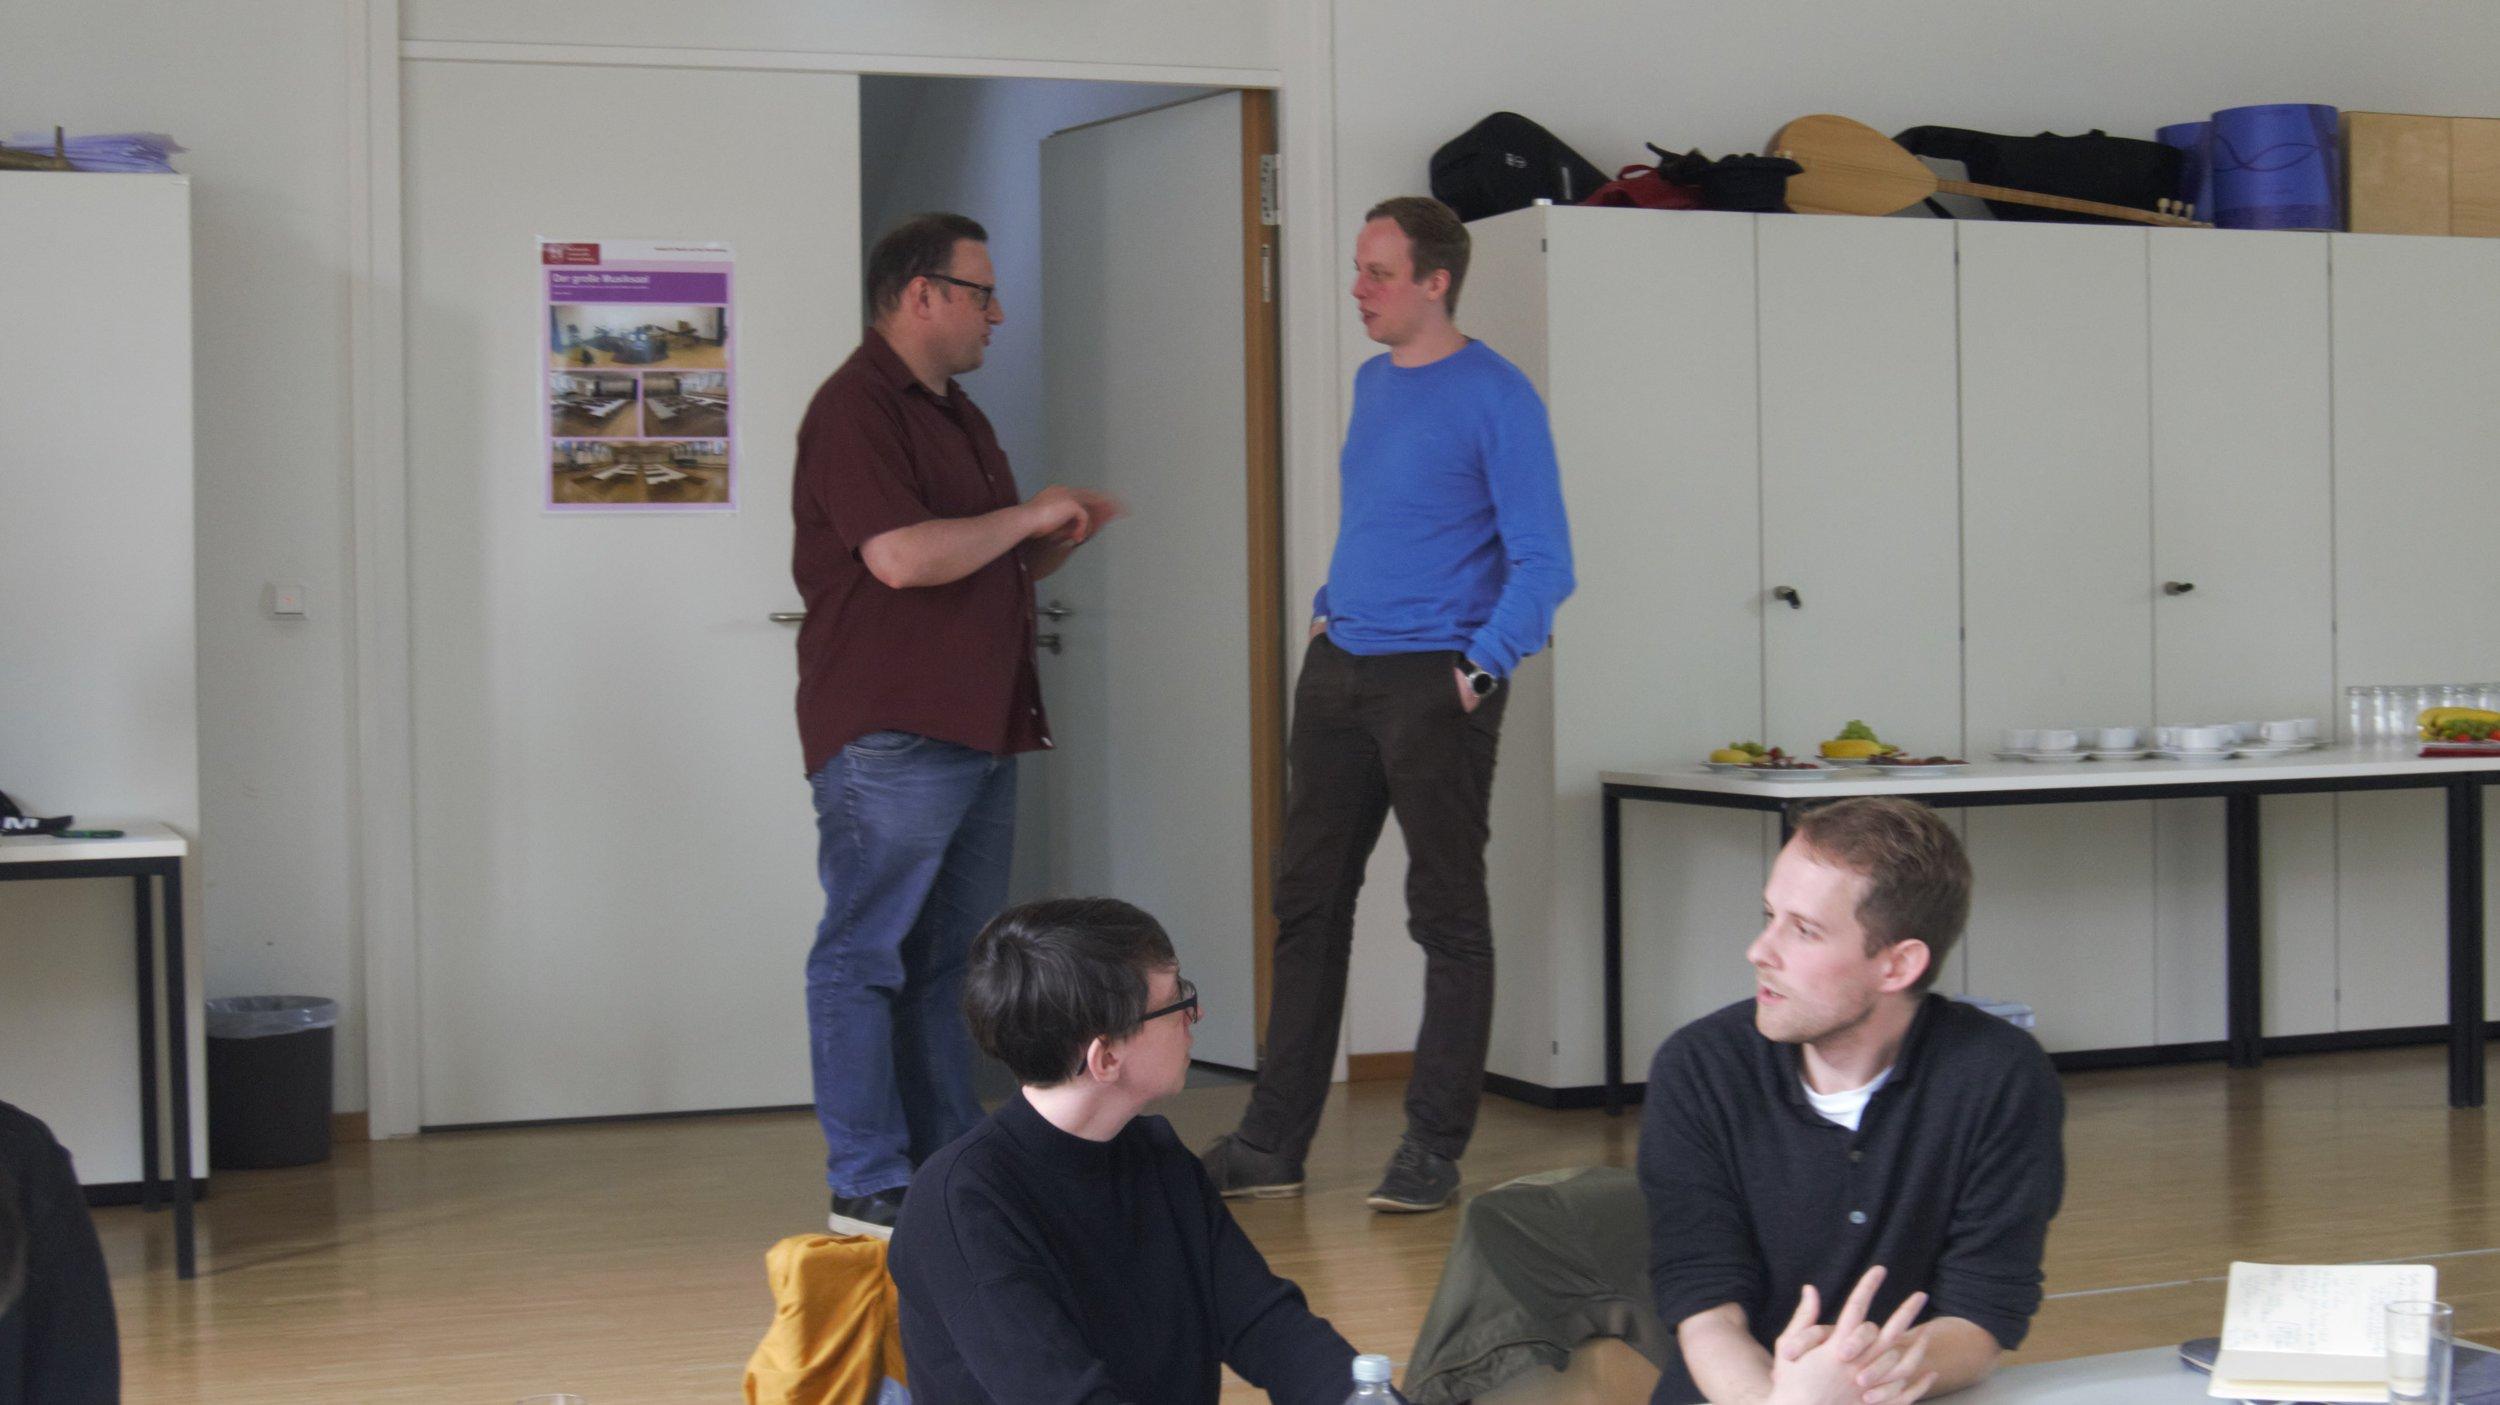 CMP Braunschweig 17.05.2019 - Pausengespräch